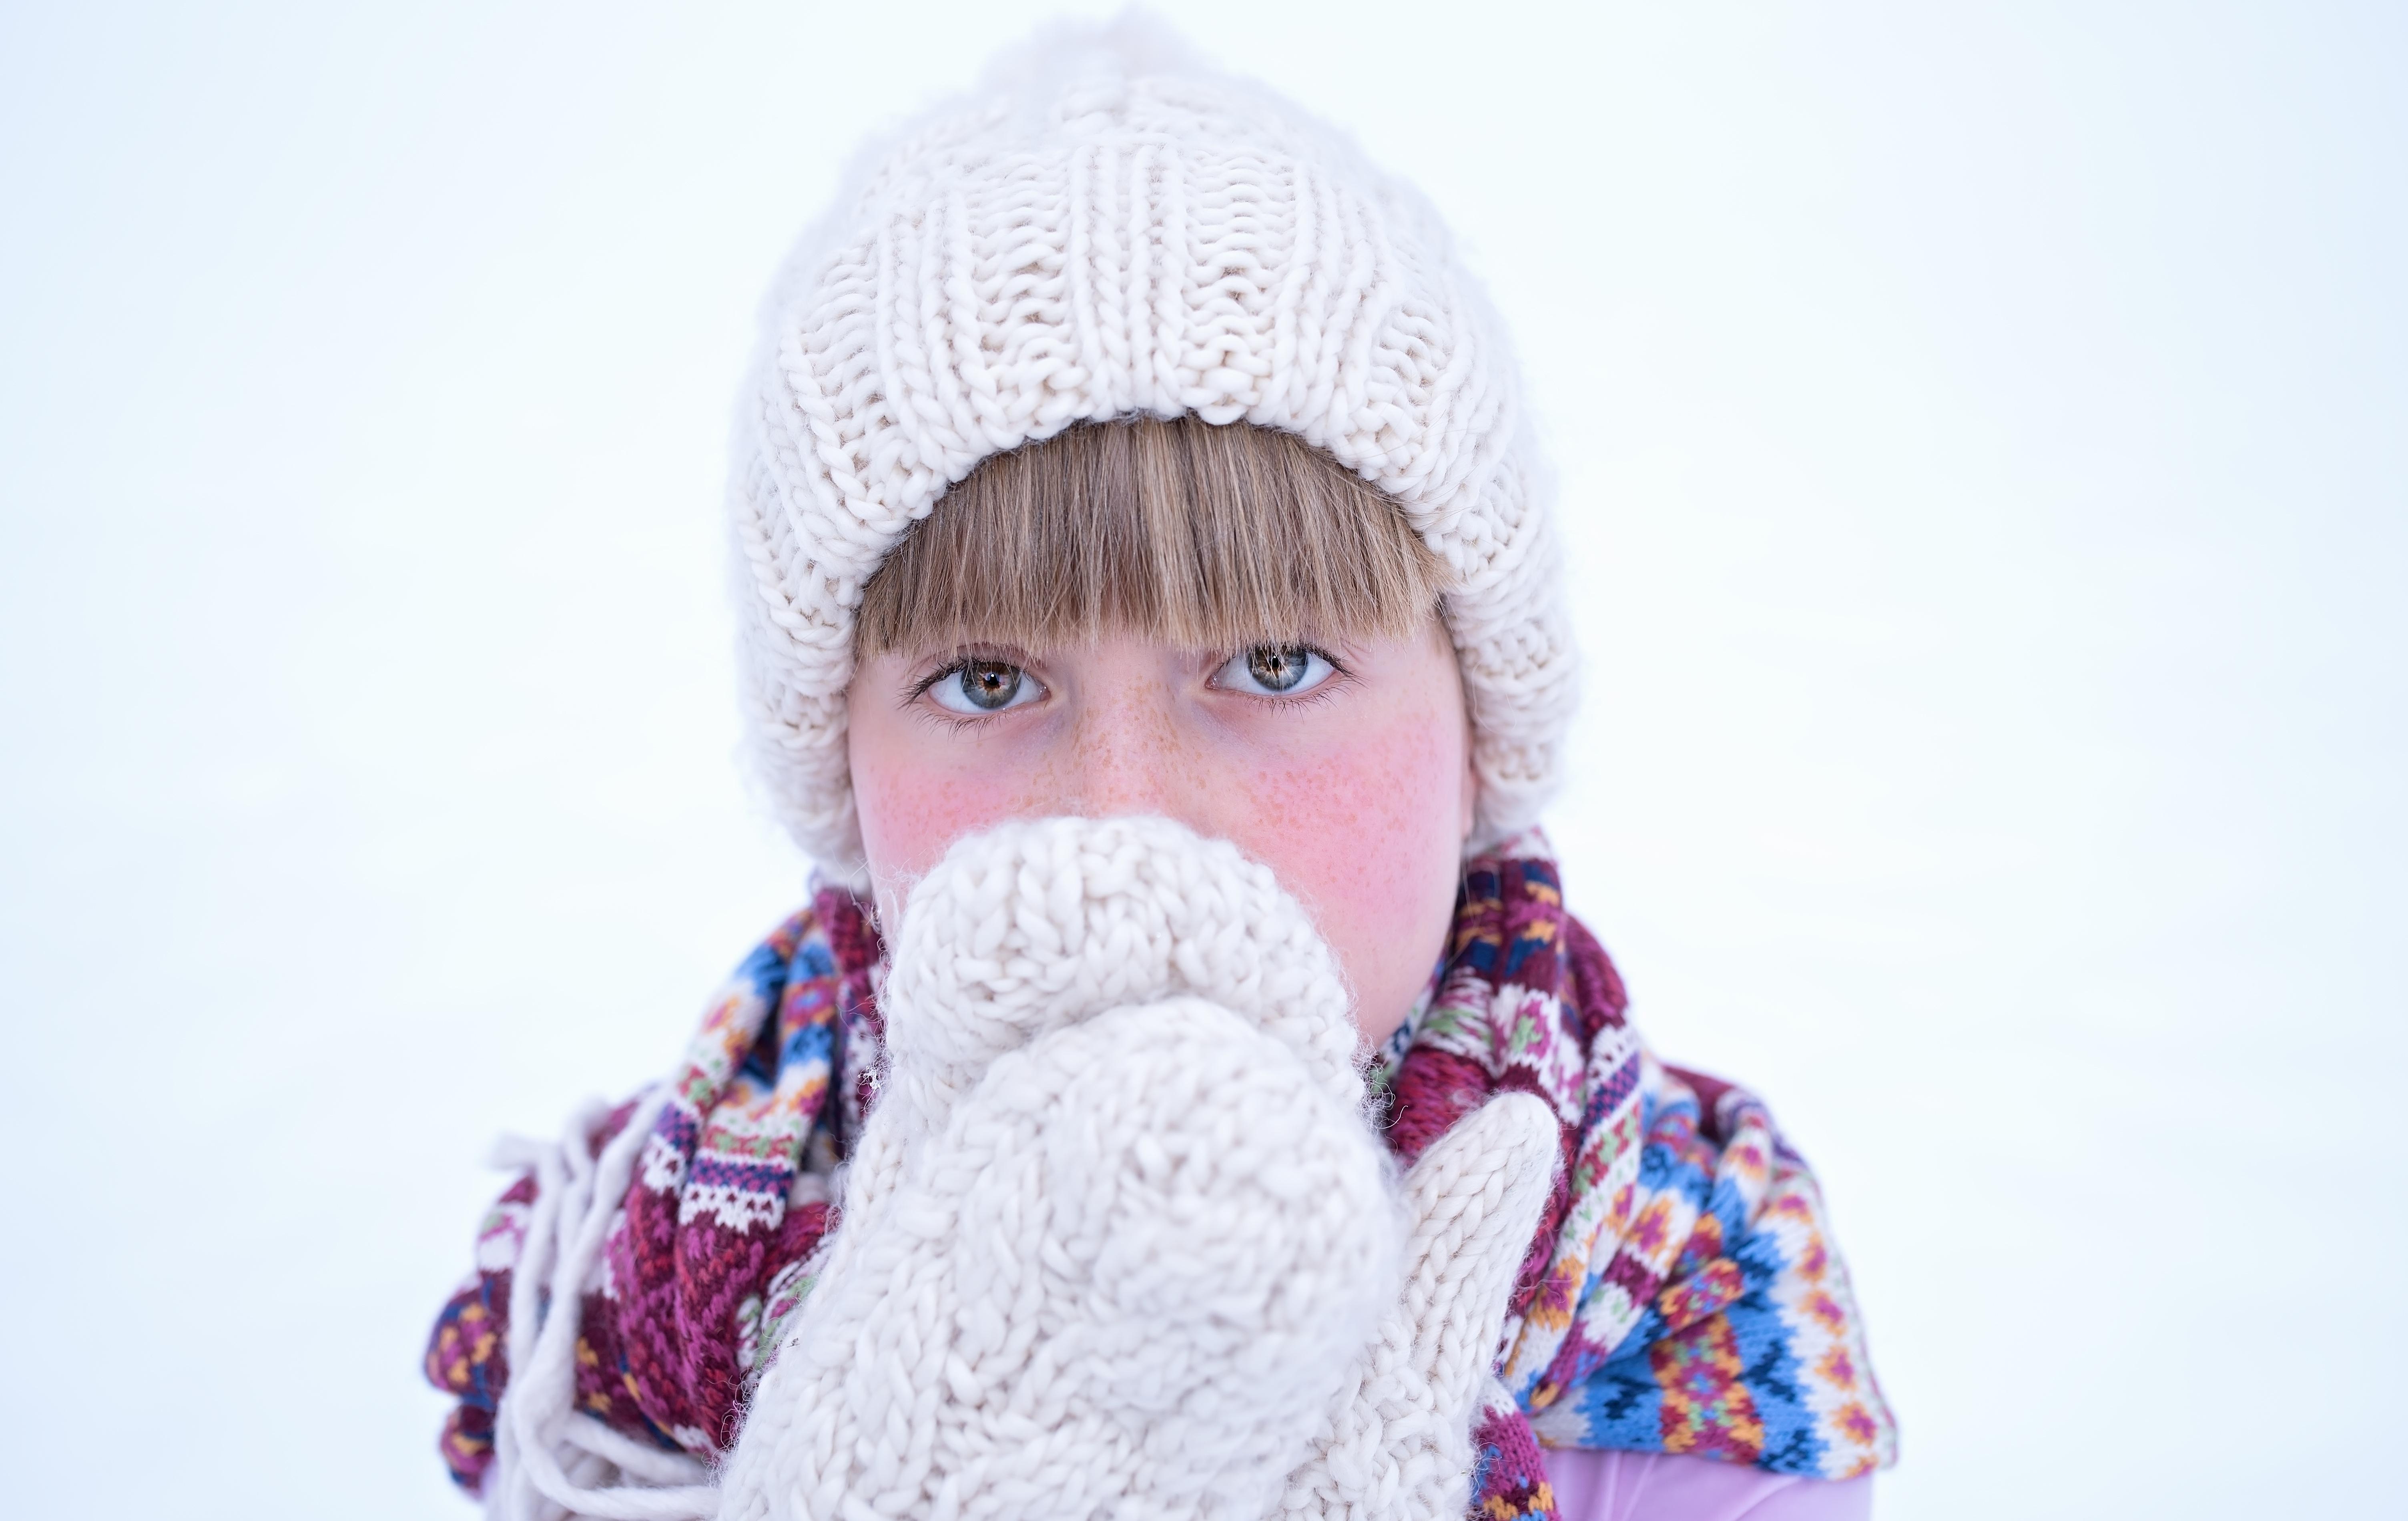 person snow winter girl hair isolated portrait child human hat clothing  close headgear hairstyle beard beanie dd66814d9a8e